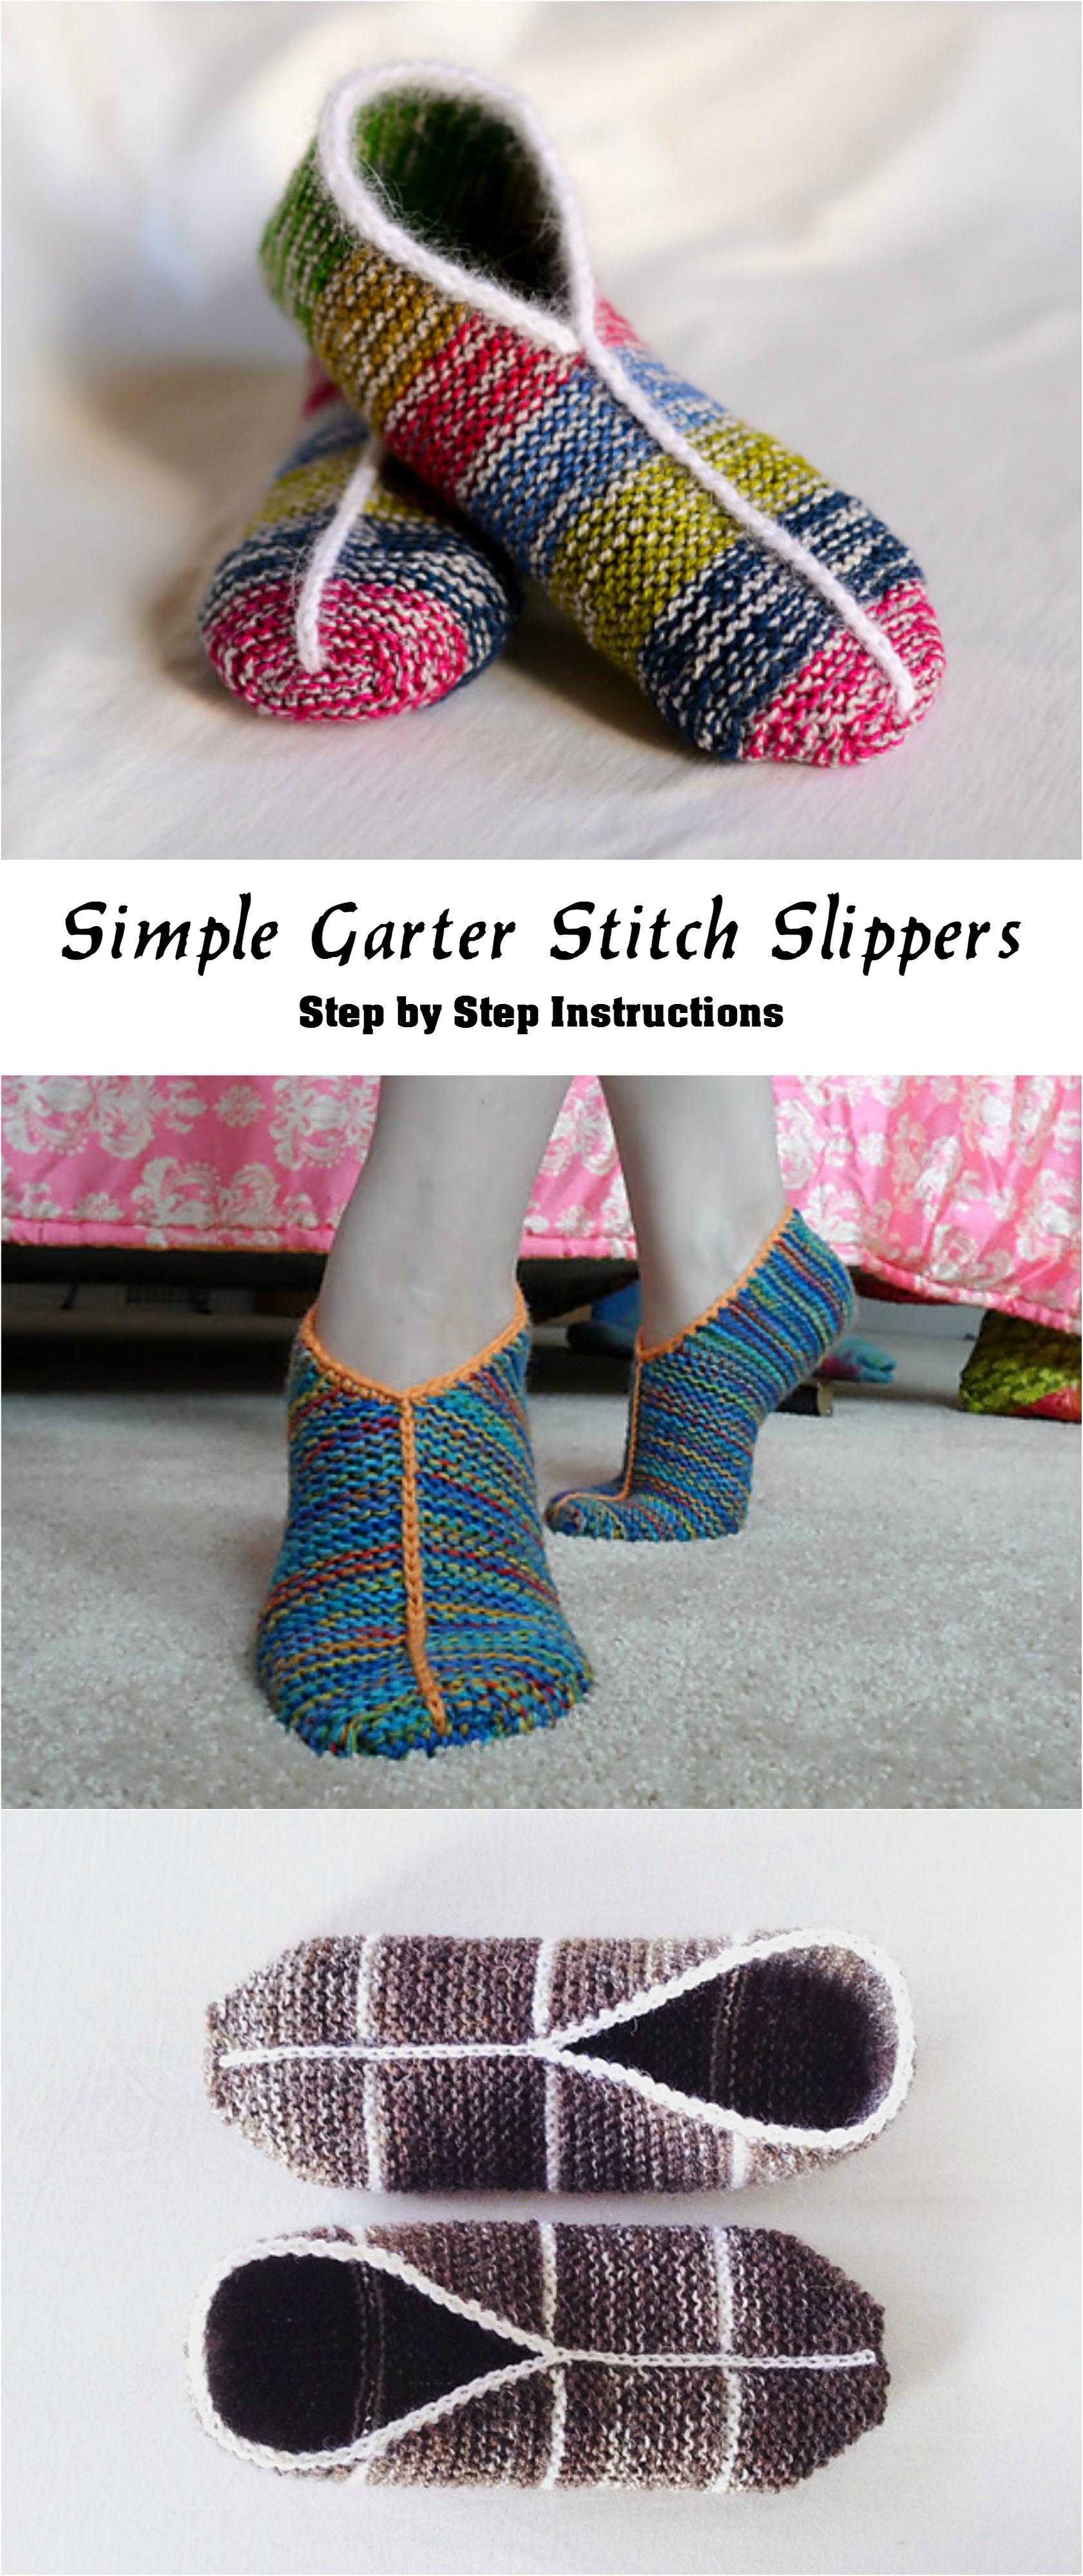 Knit Simple Garter Stitch Slippers - Pretty Ideas